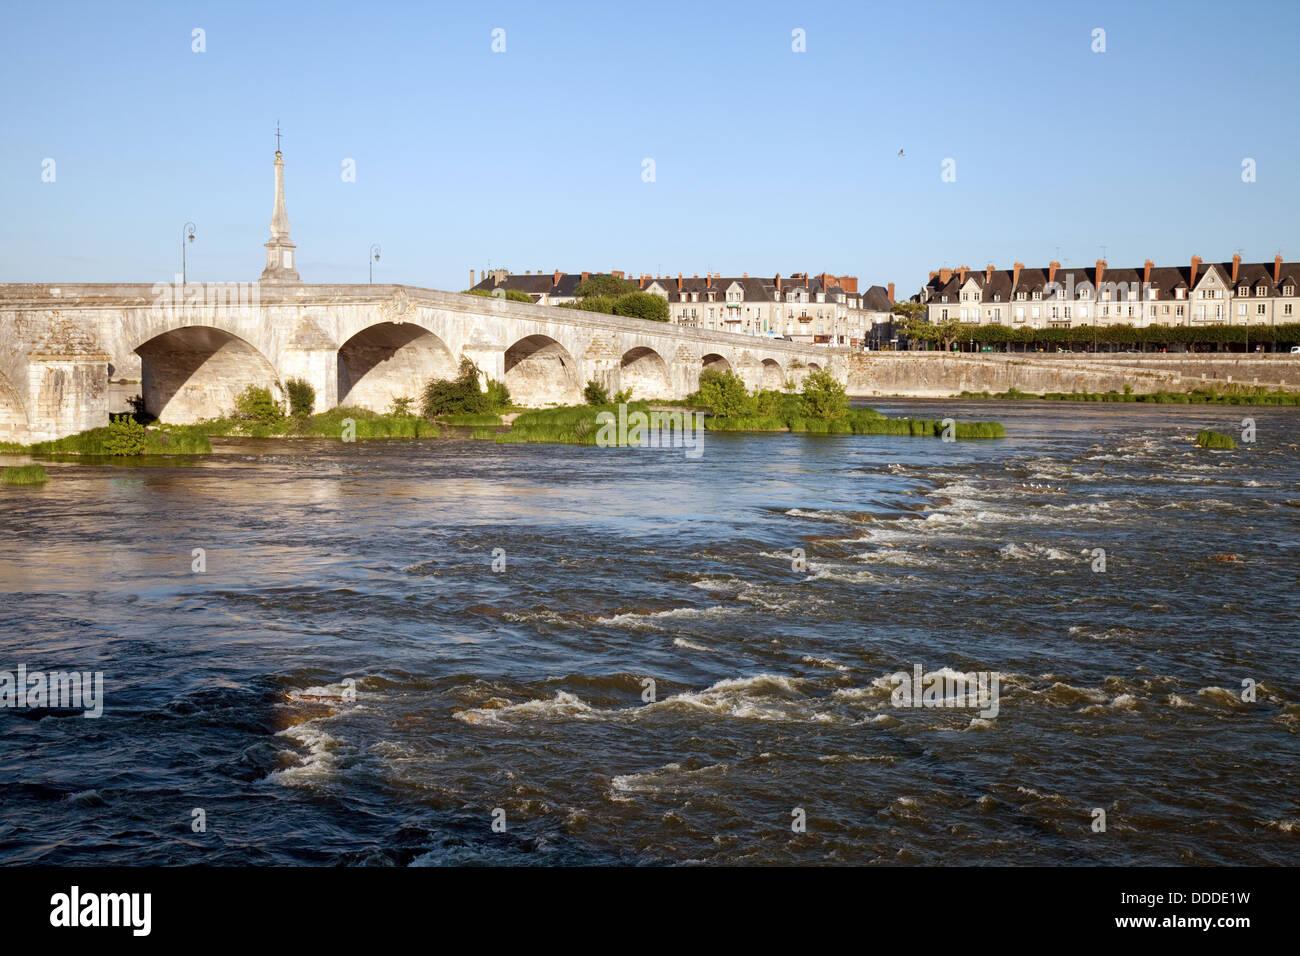 The 18th century bridge over the River Loire at Blois, Loire-et-Cher, France Europe - Stock Image